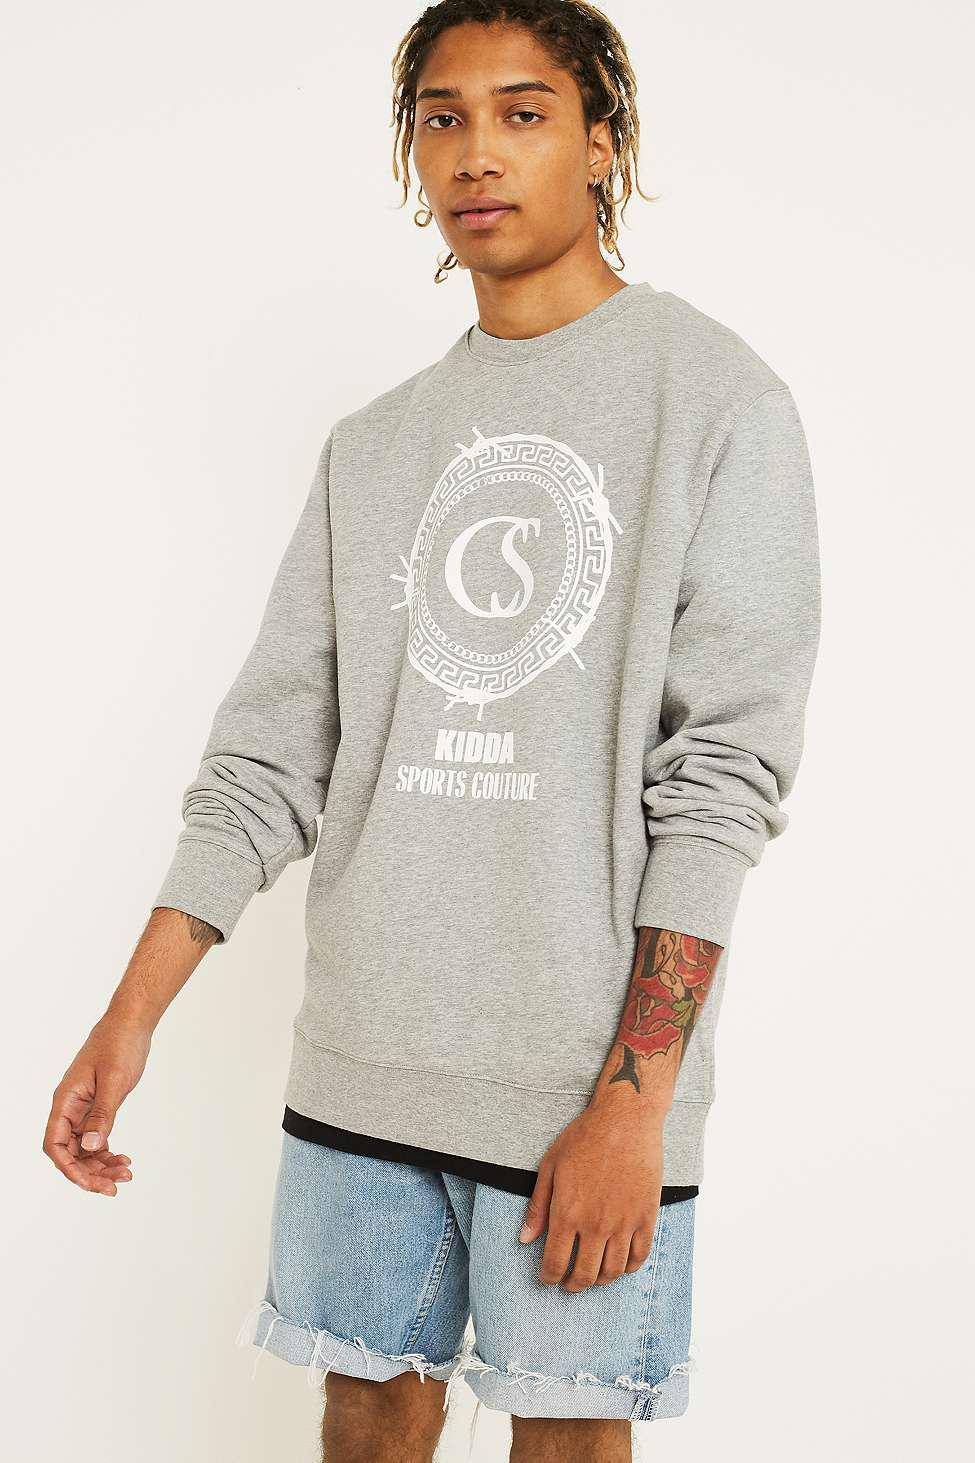 2a1235e12de Christopher Shannon X Uo Kidda Logo Grey Sweatshirt in Gray for Men ...